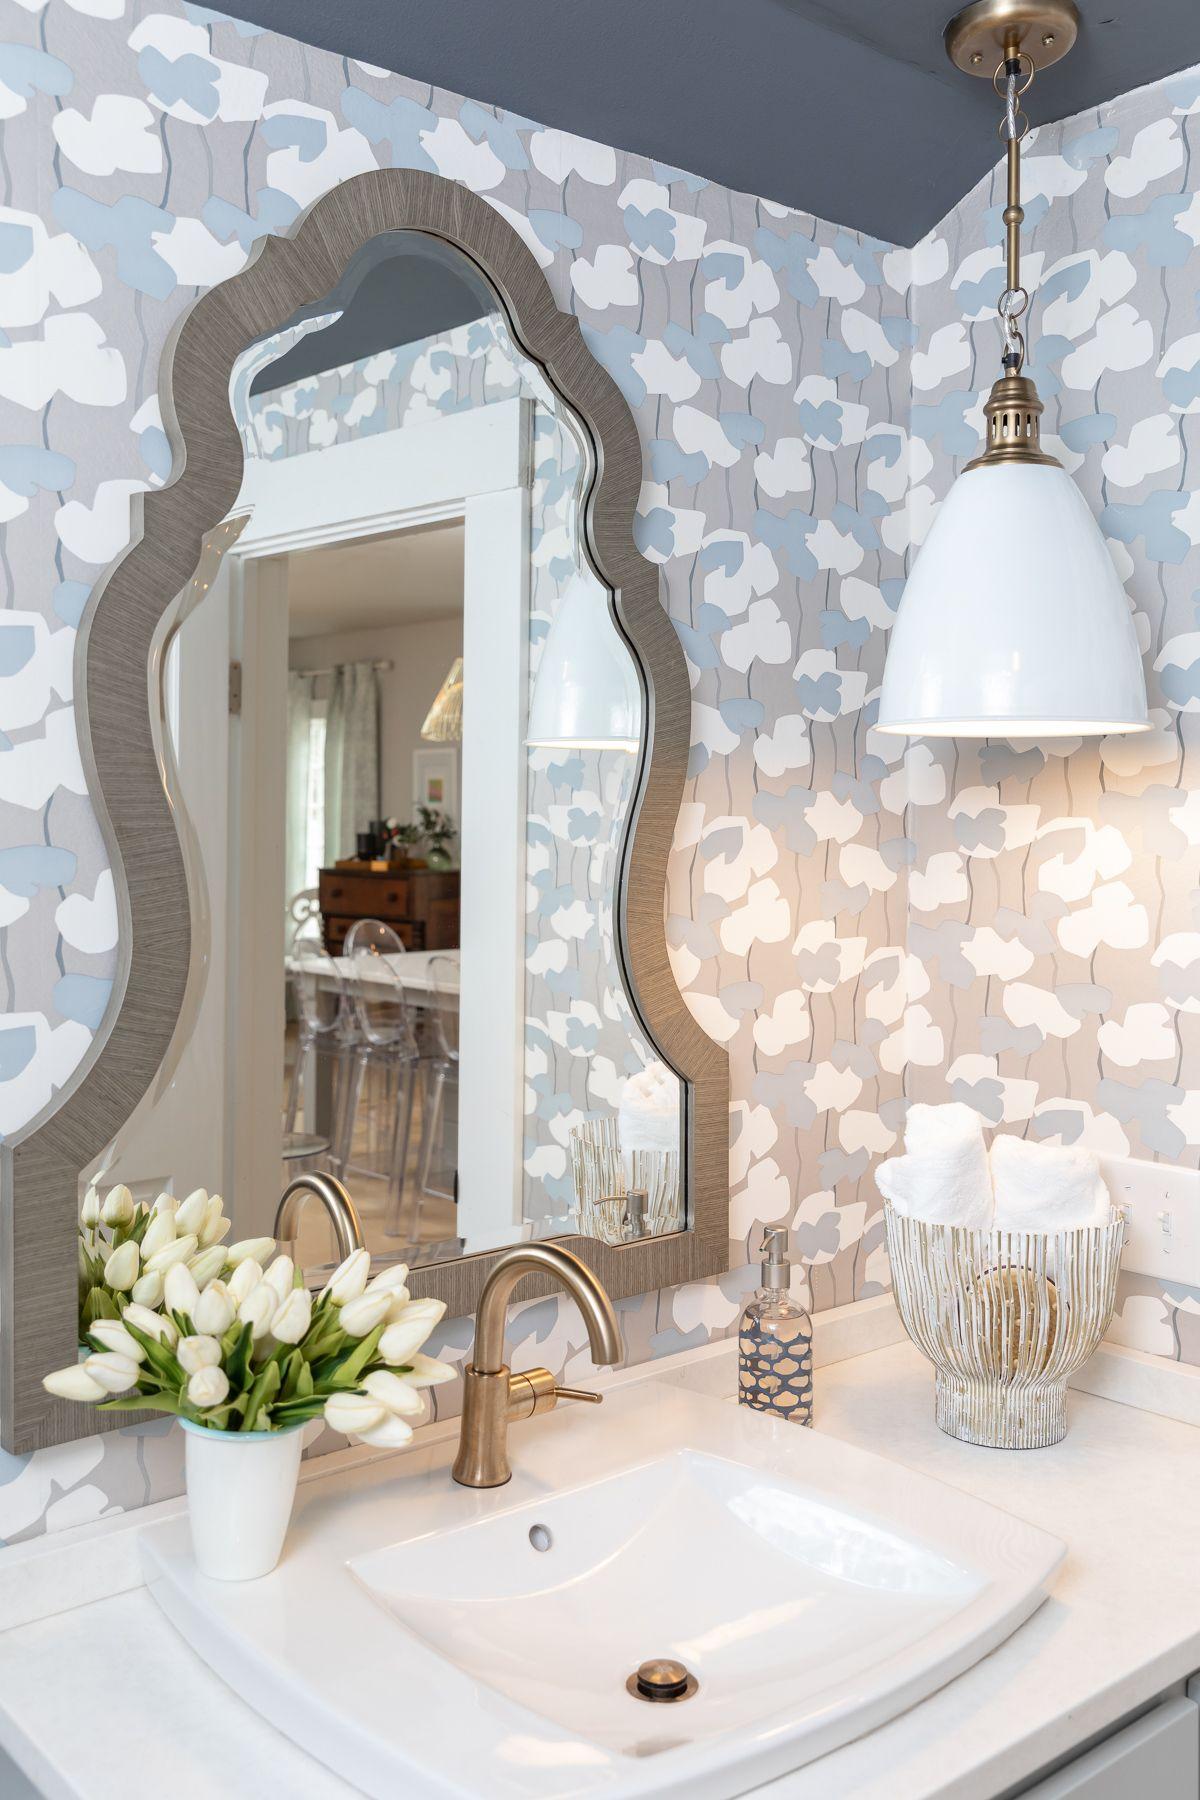 Scandinavian Cottage - In Detail Interiors #cottage #design #interiordesign #interior #design #home #homedecor #bathroom #bathdesign